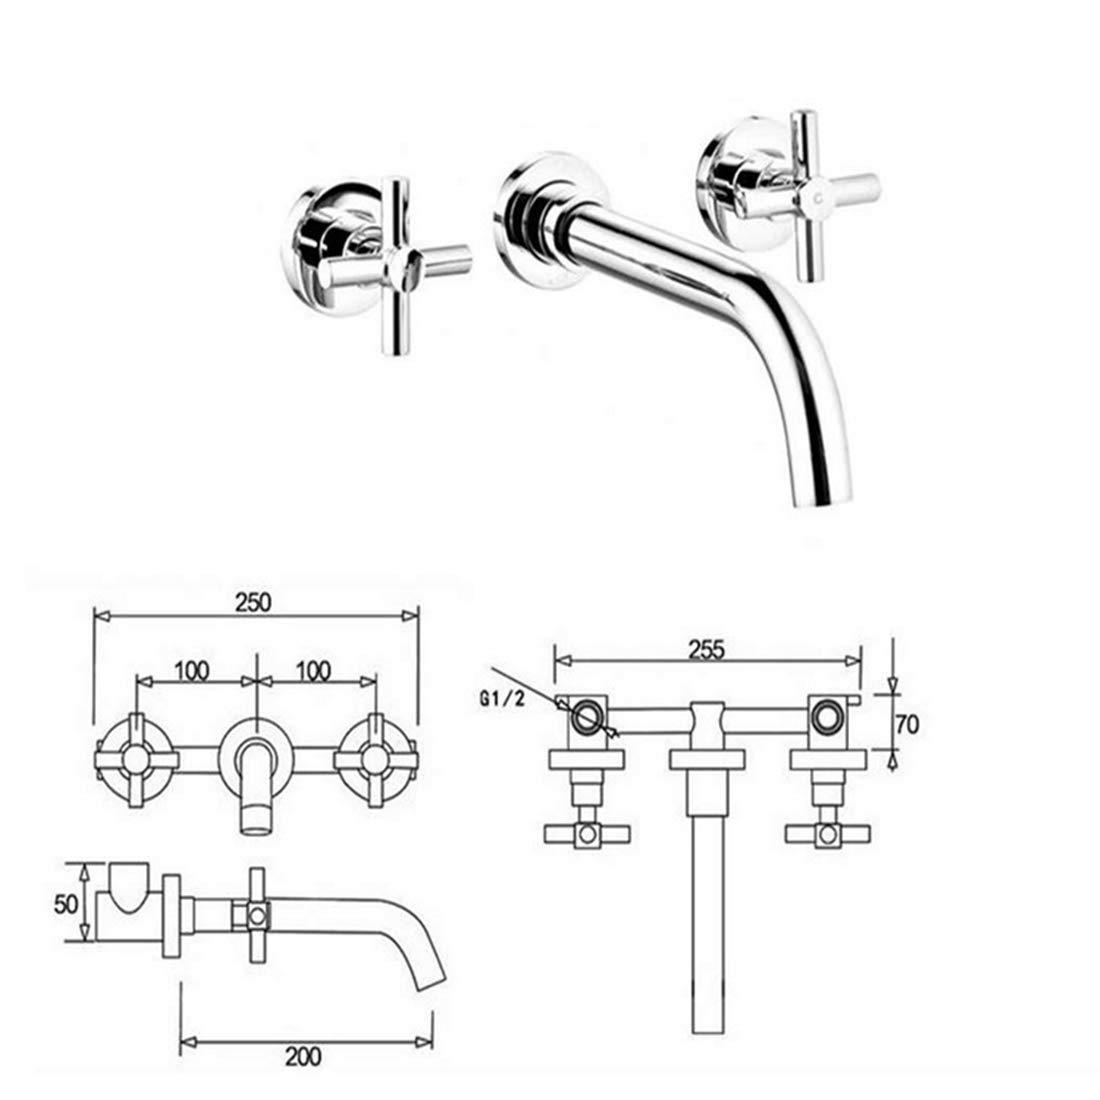 Armaturen Becken Mixerdeck Montiert Messing Vanity Sink Mischbatterie Hot & Cold Gold Messing Bad Becken Wasserhahn